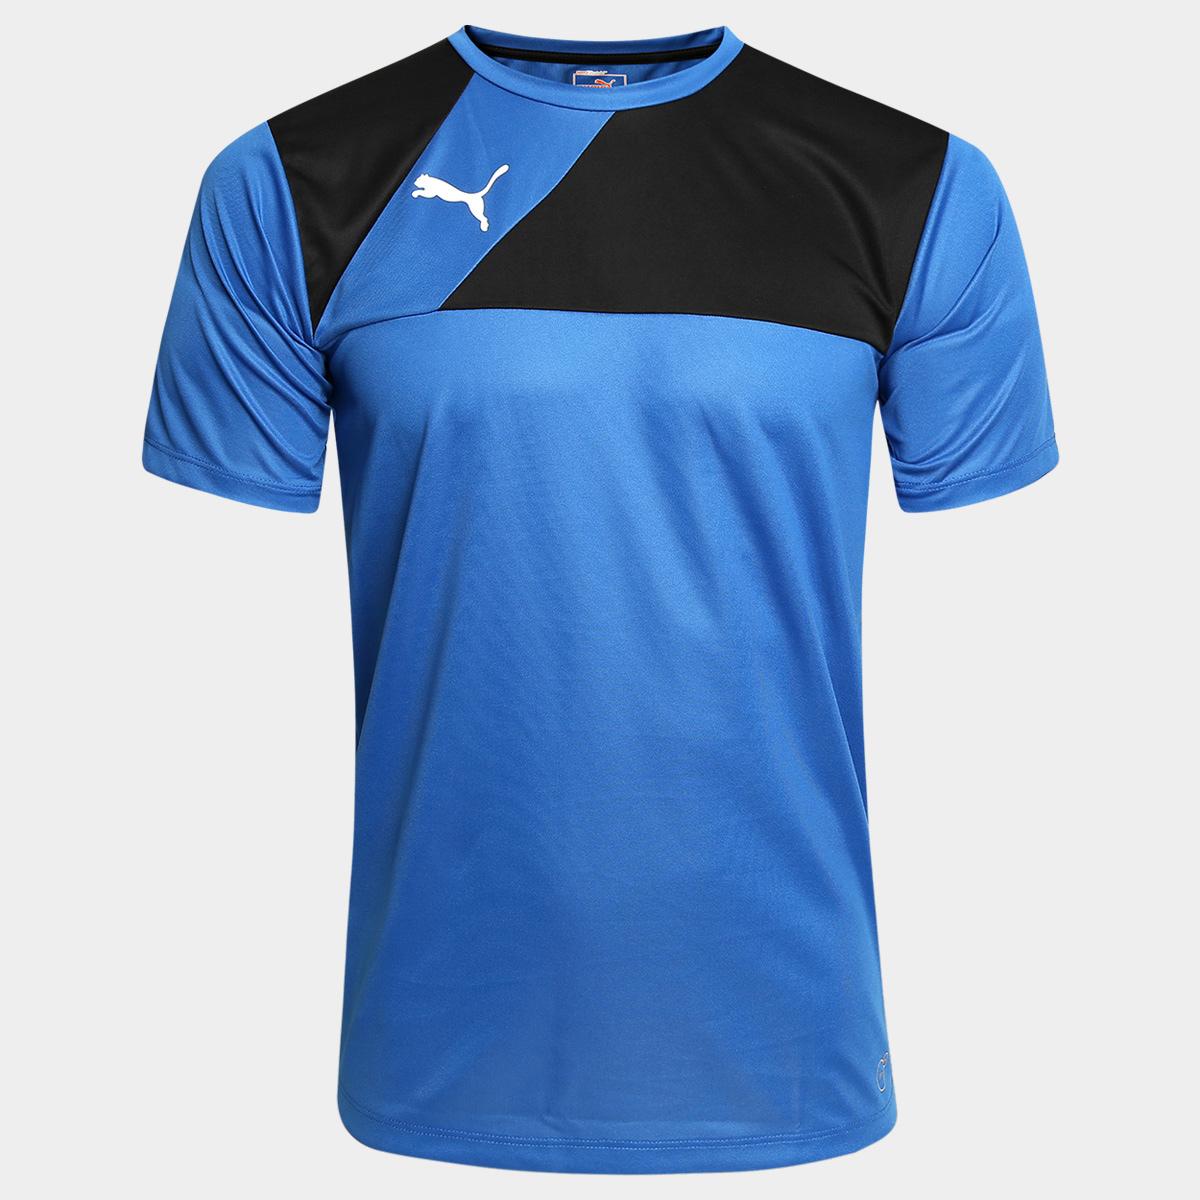 91b69a80d Camisa Puma BR Entry Training Jersey Masculina - Azul e Preto ...